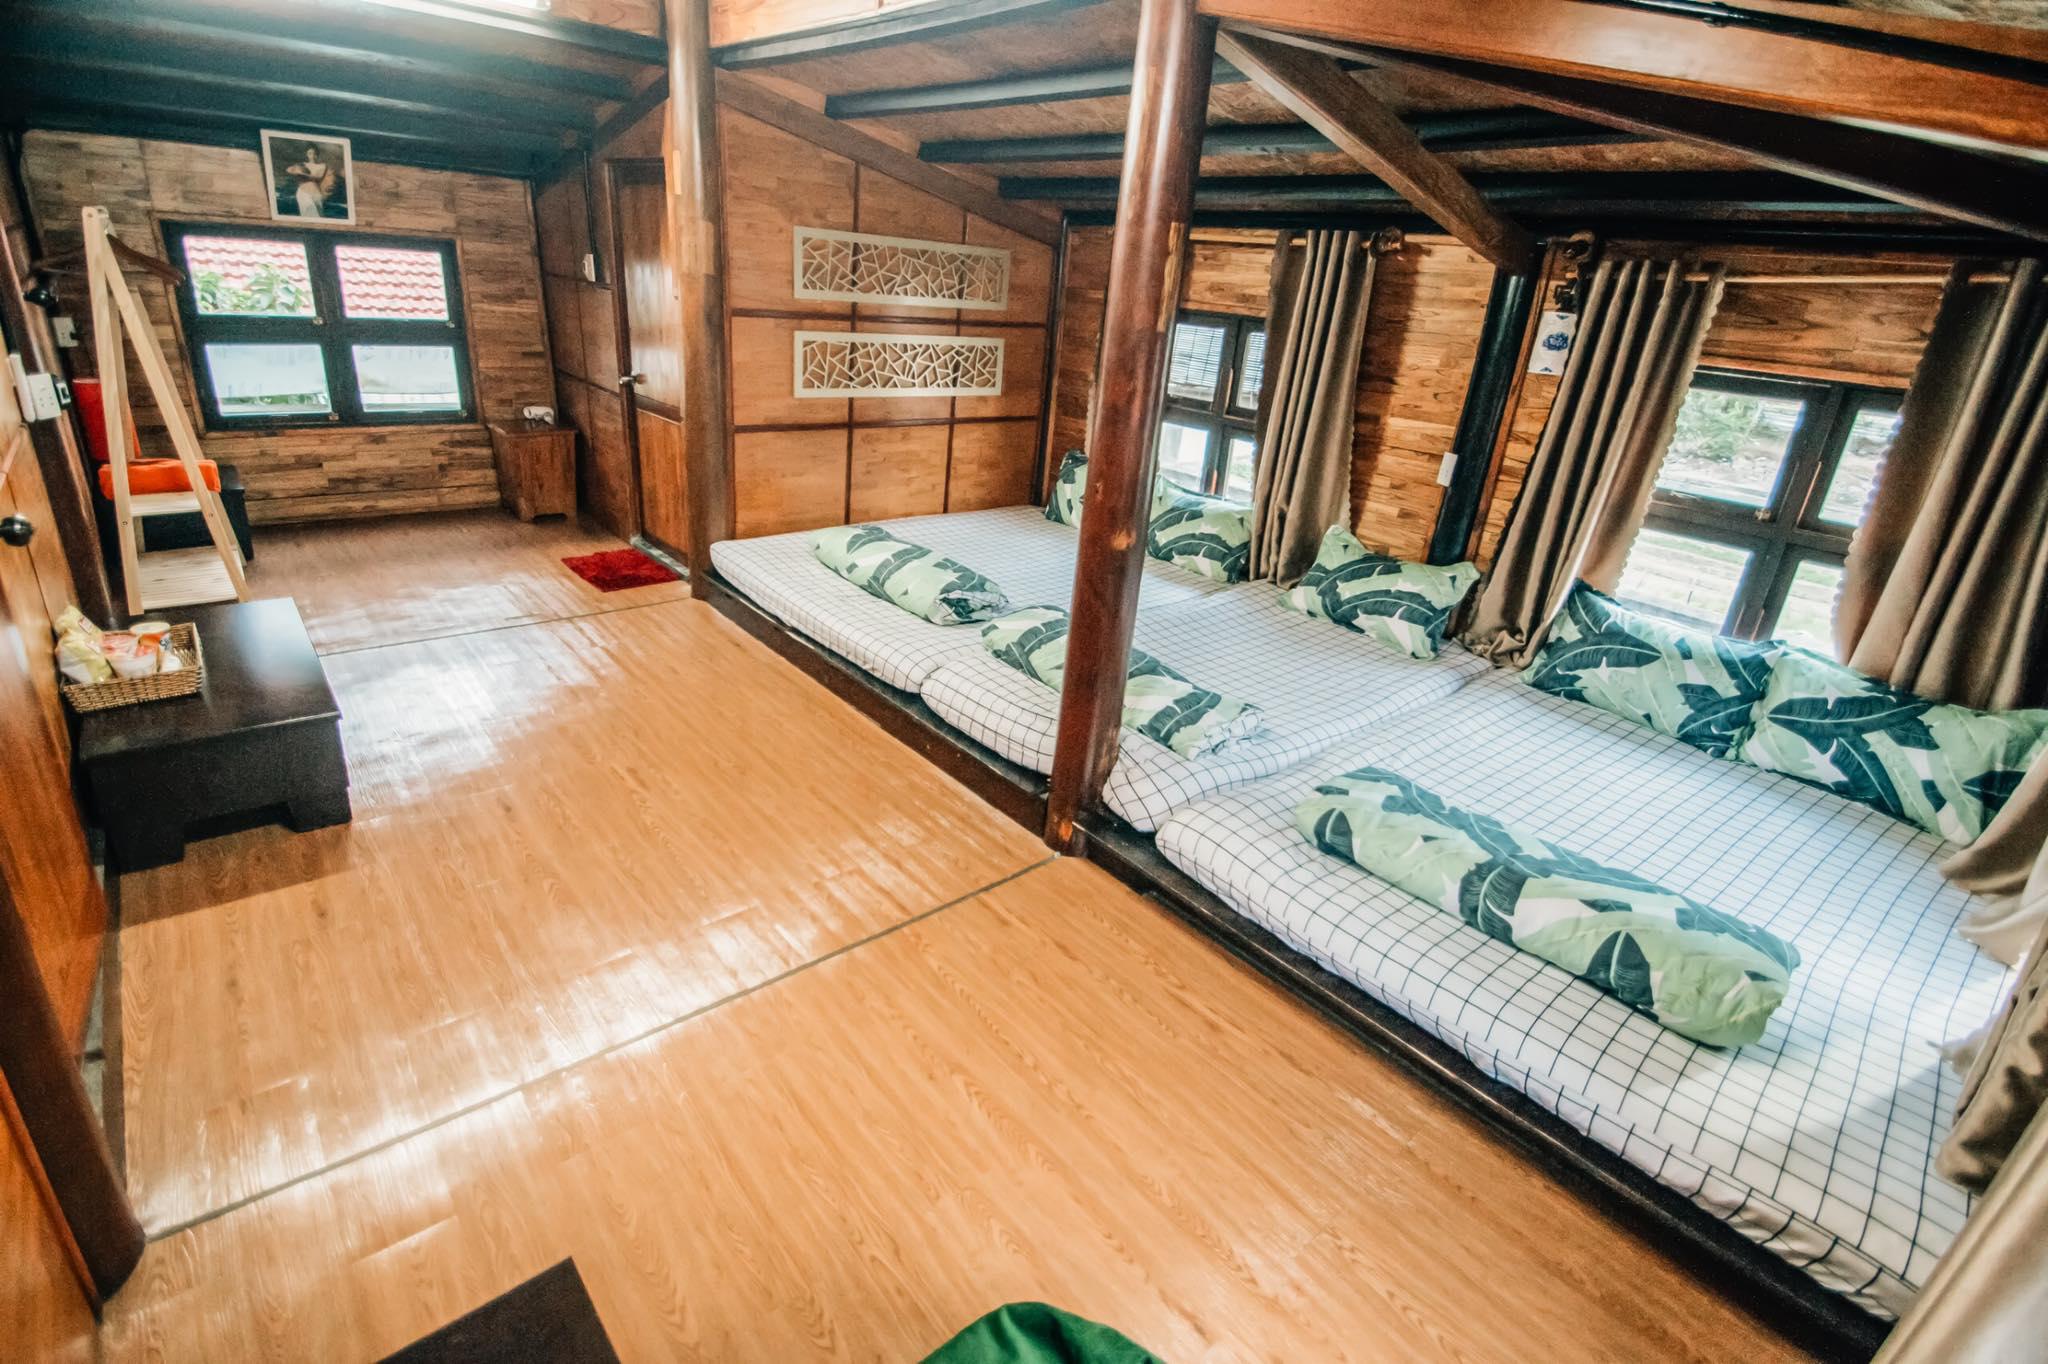 4 Bedrooms Villa For Rent in An Bang Beach Hoi An